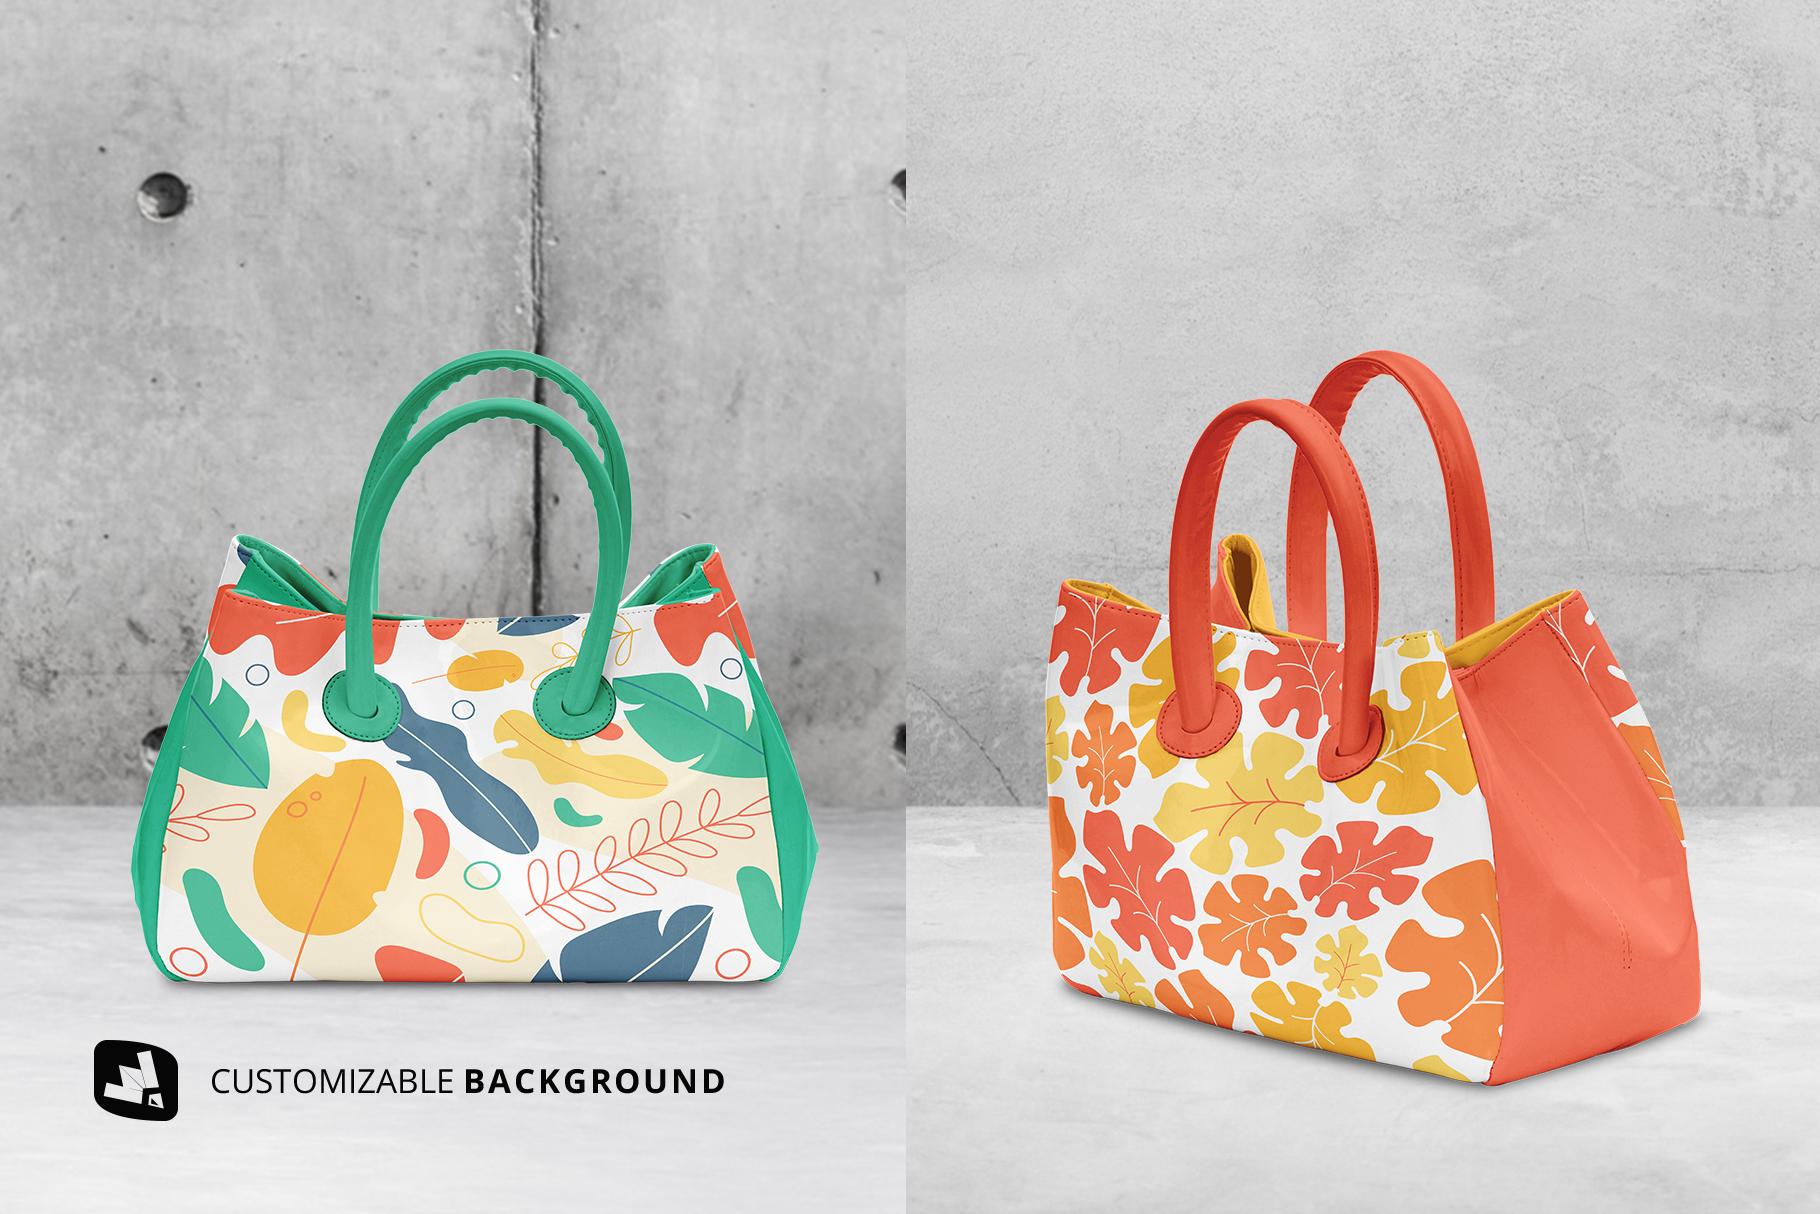 background options of the female handbag mockup